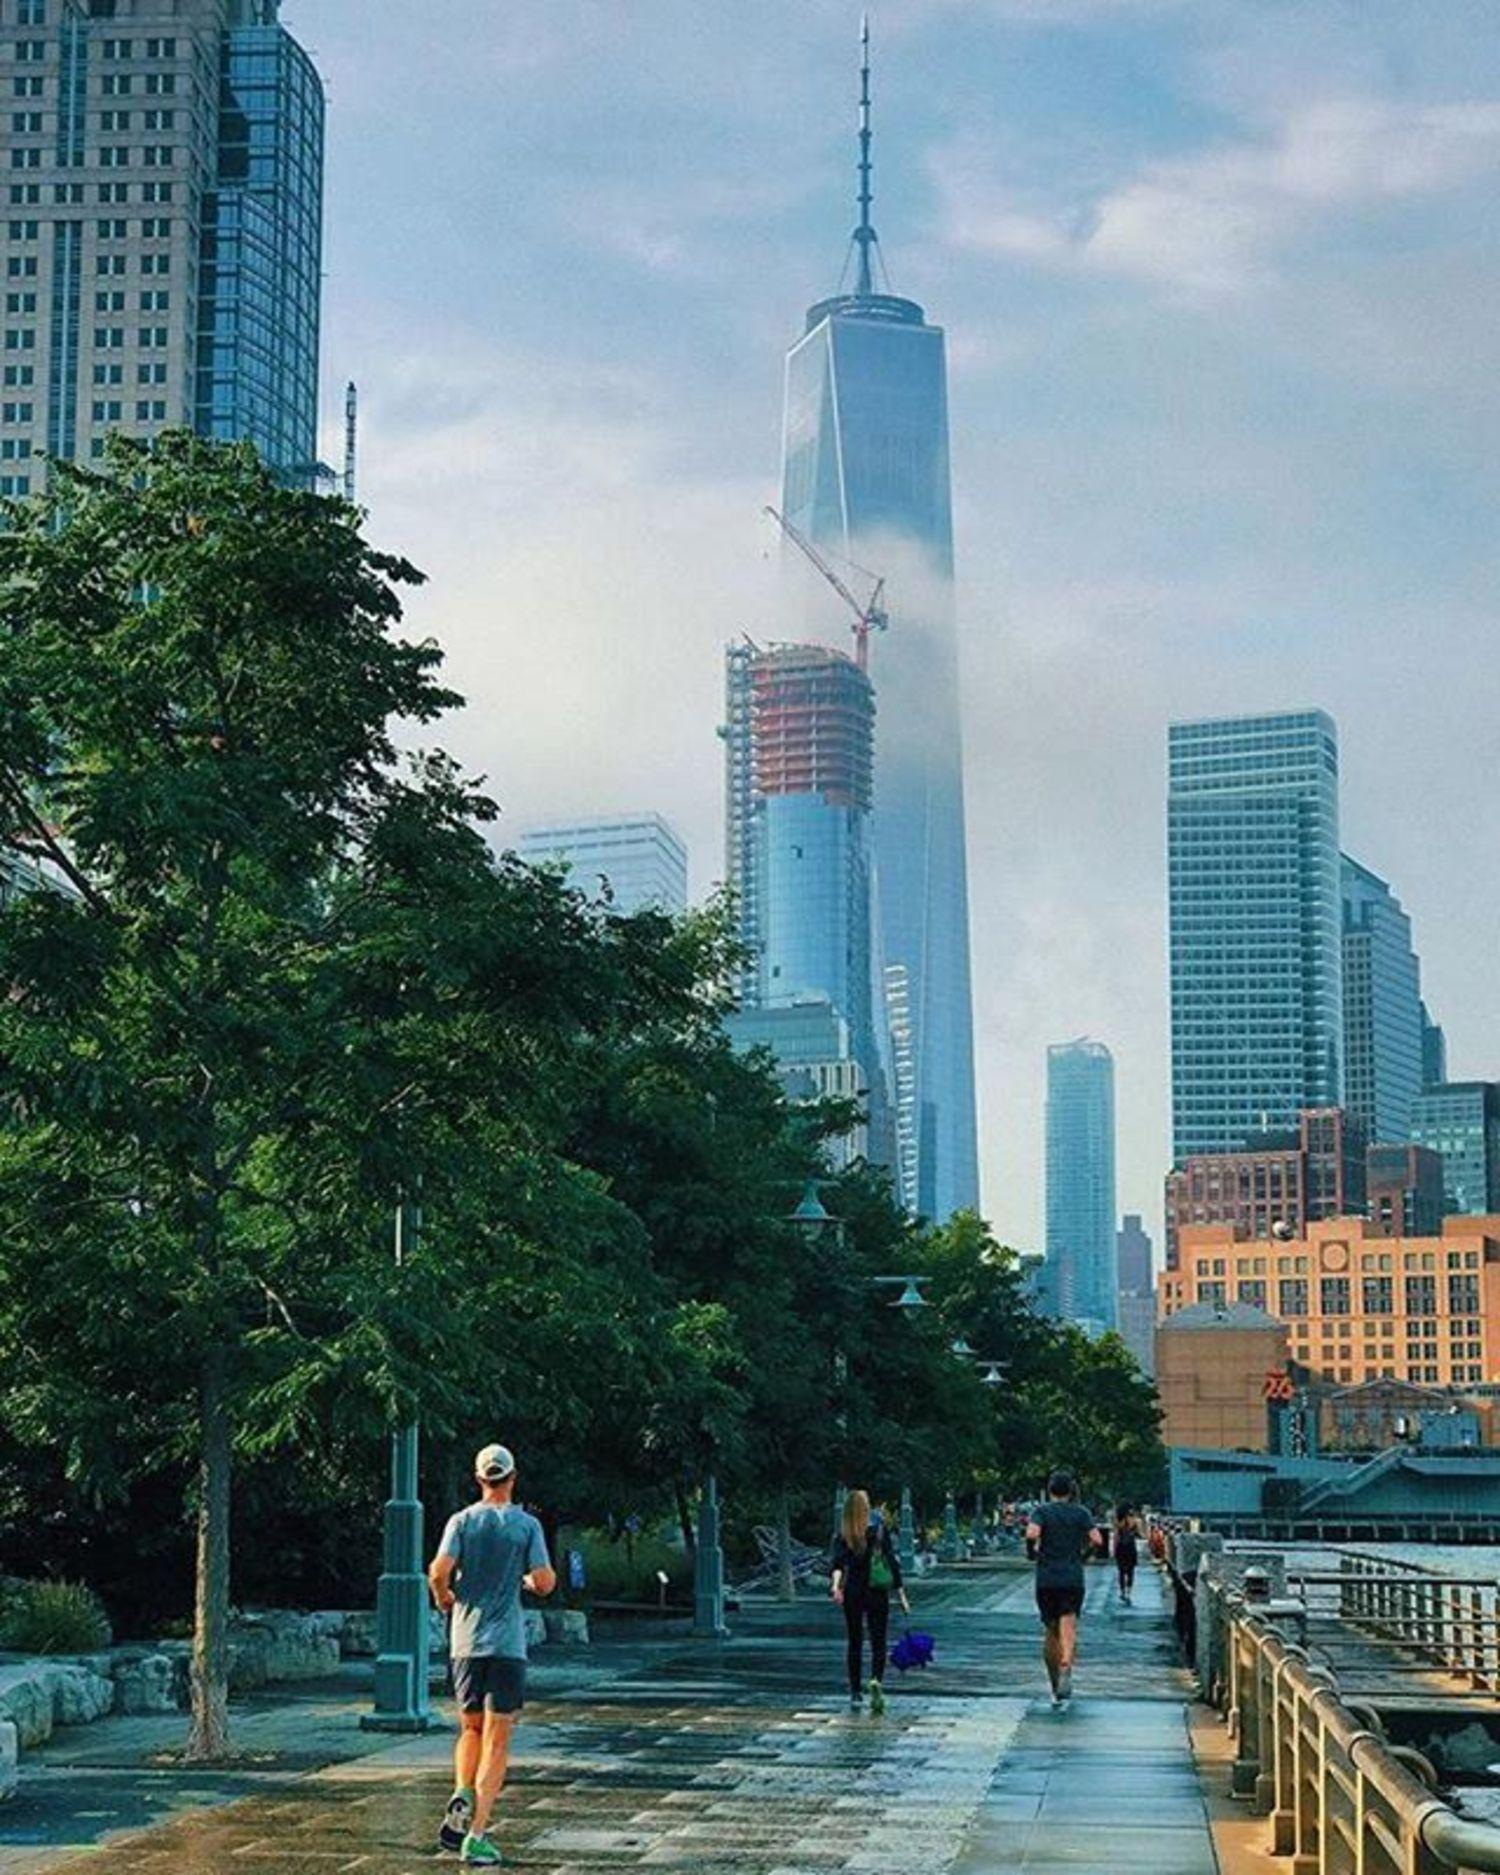 New York, New York. Photo via @melliekr #viewingnyc #newyorkcity #newyork